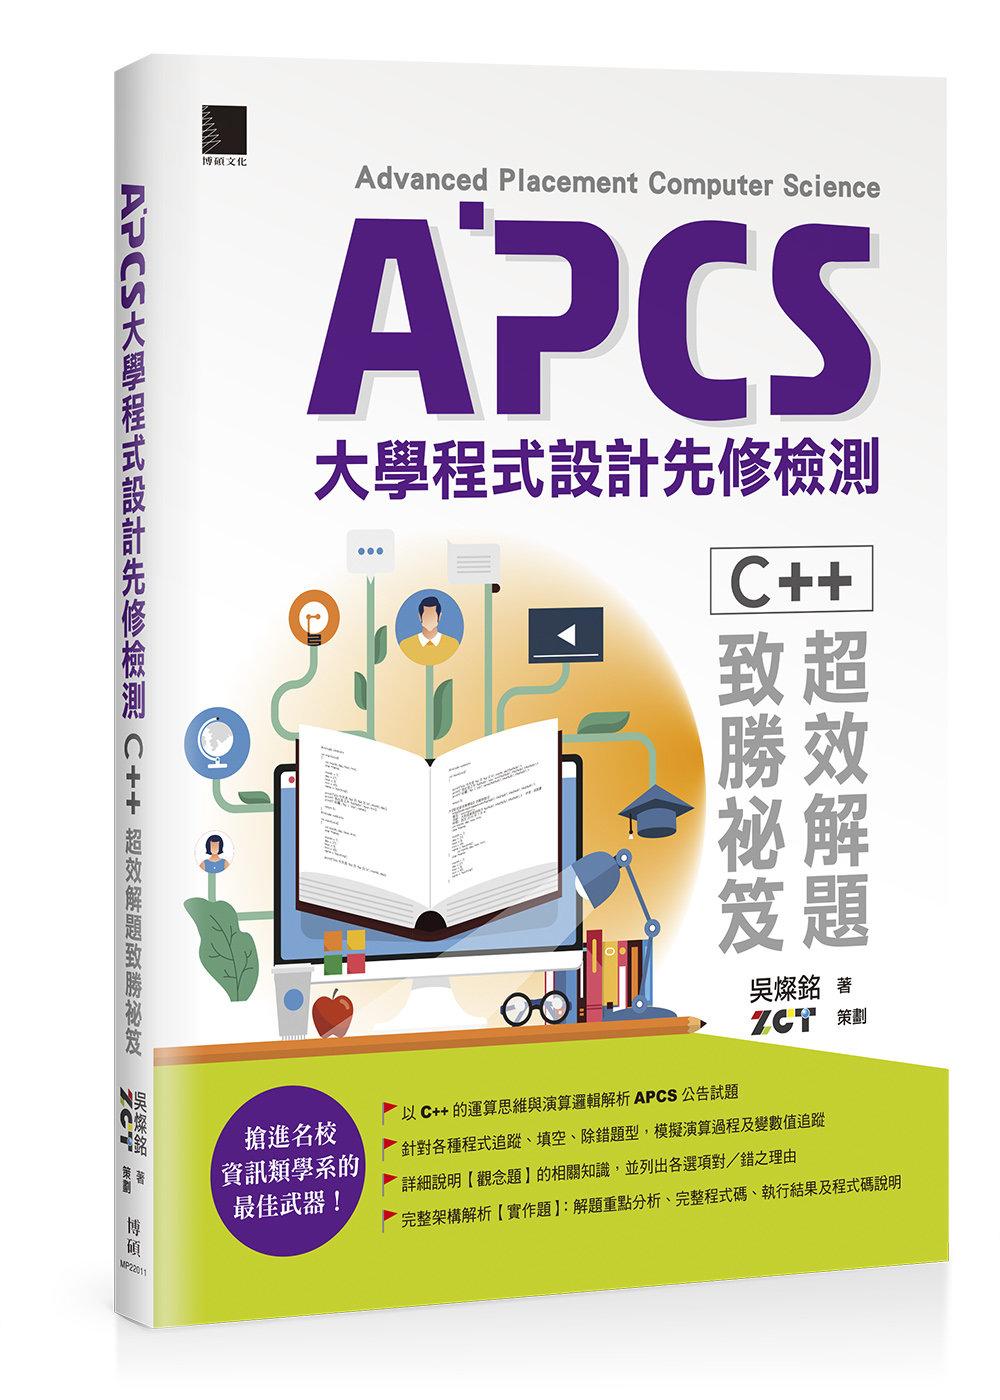 APCS 大學程式設計先修檢測:C++ 超效解題致勝祕笈-preview-12